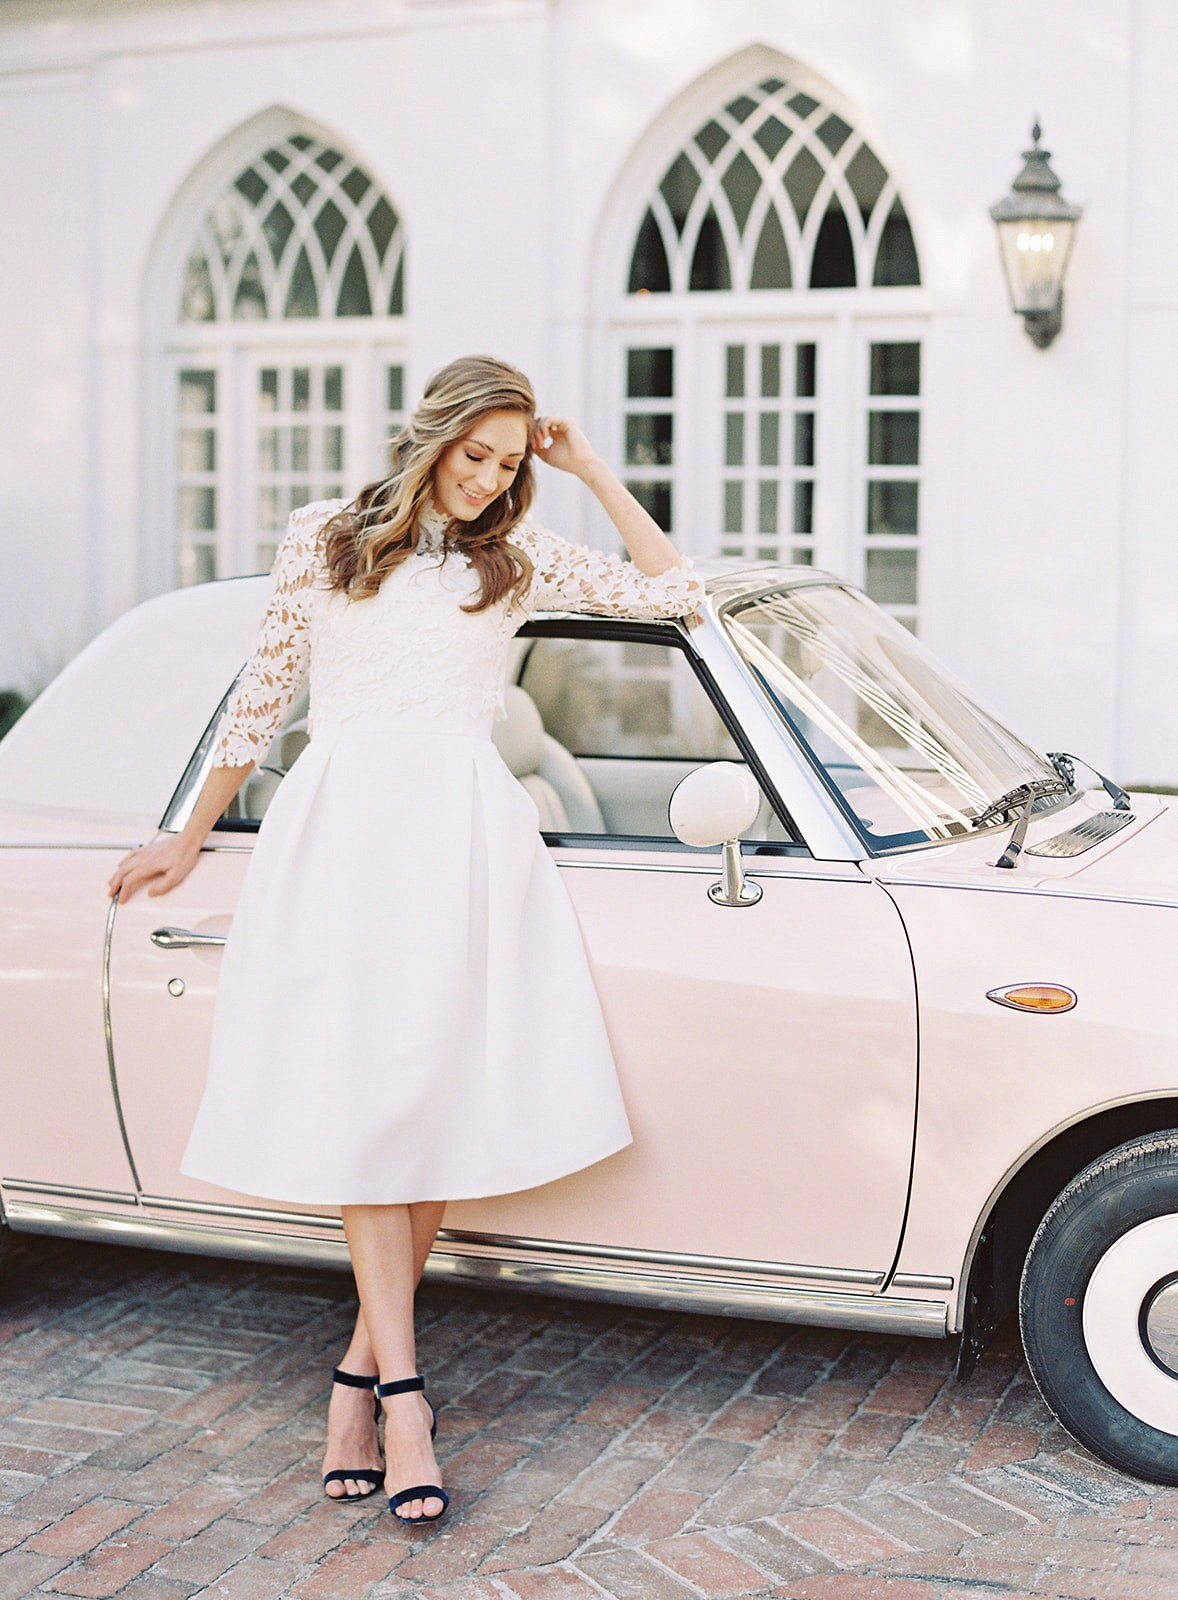 WEDDING DRESSES 2023